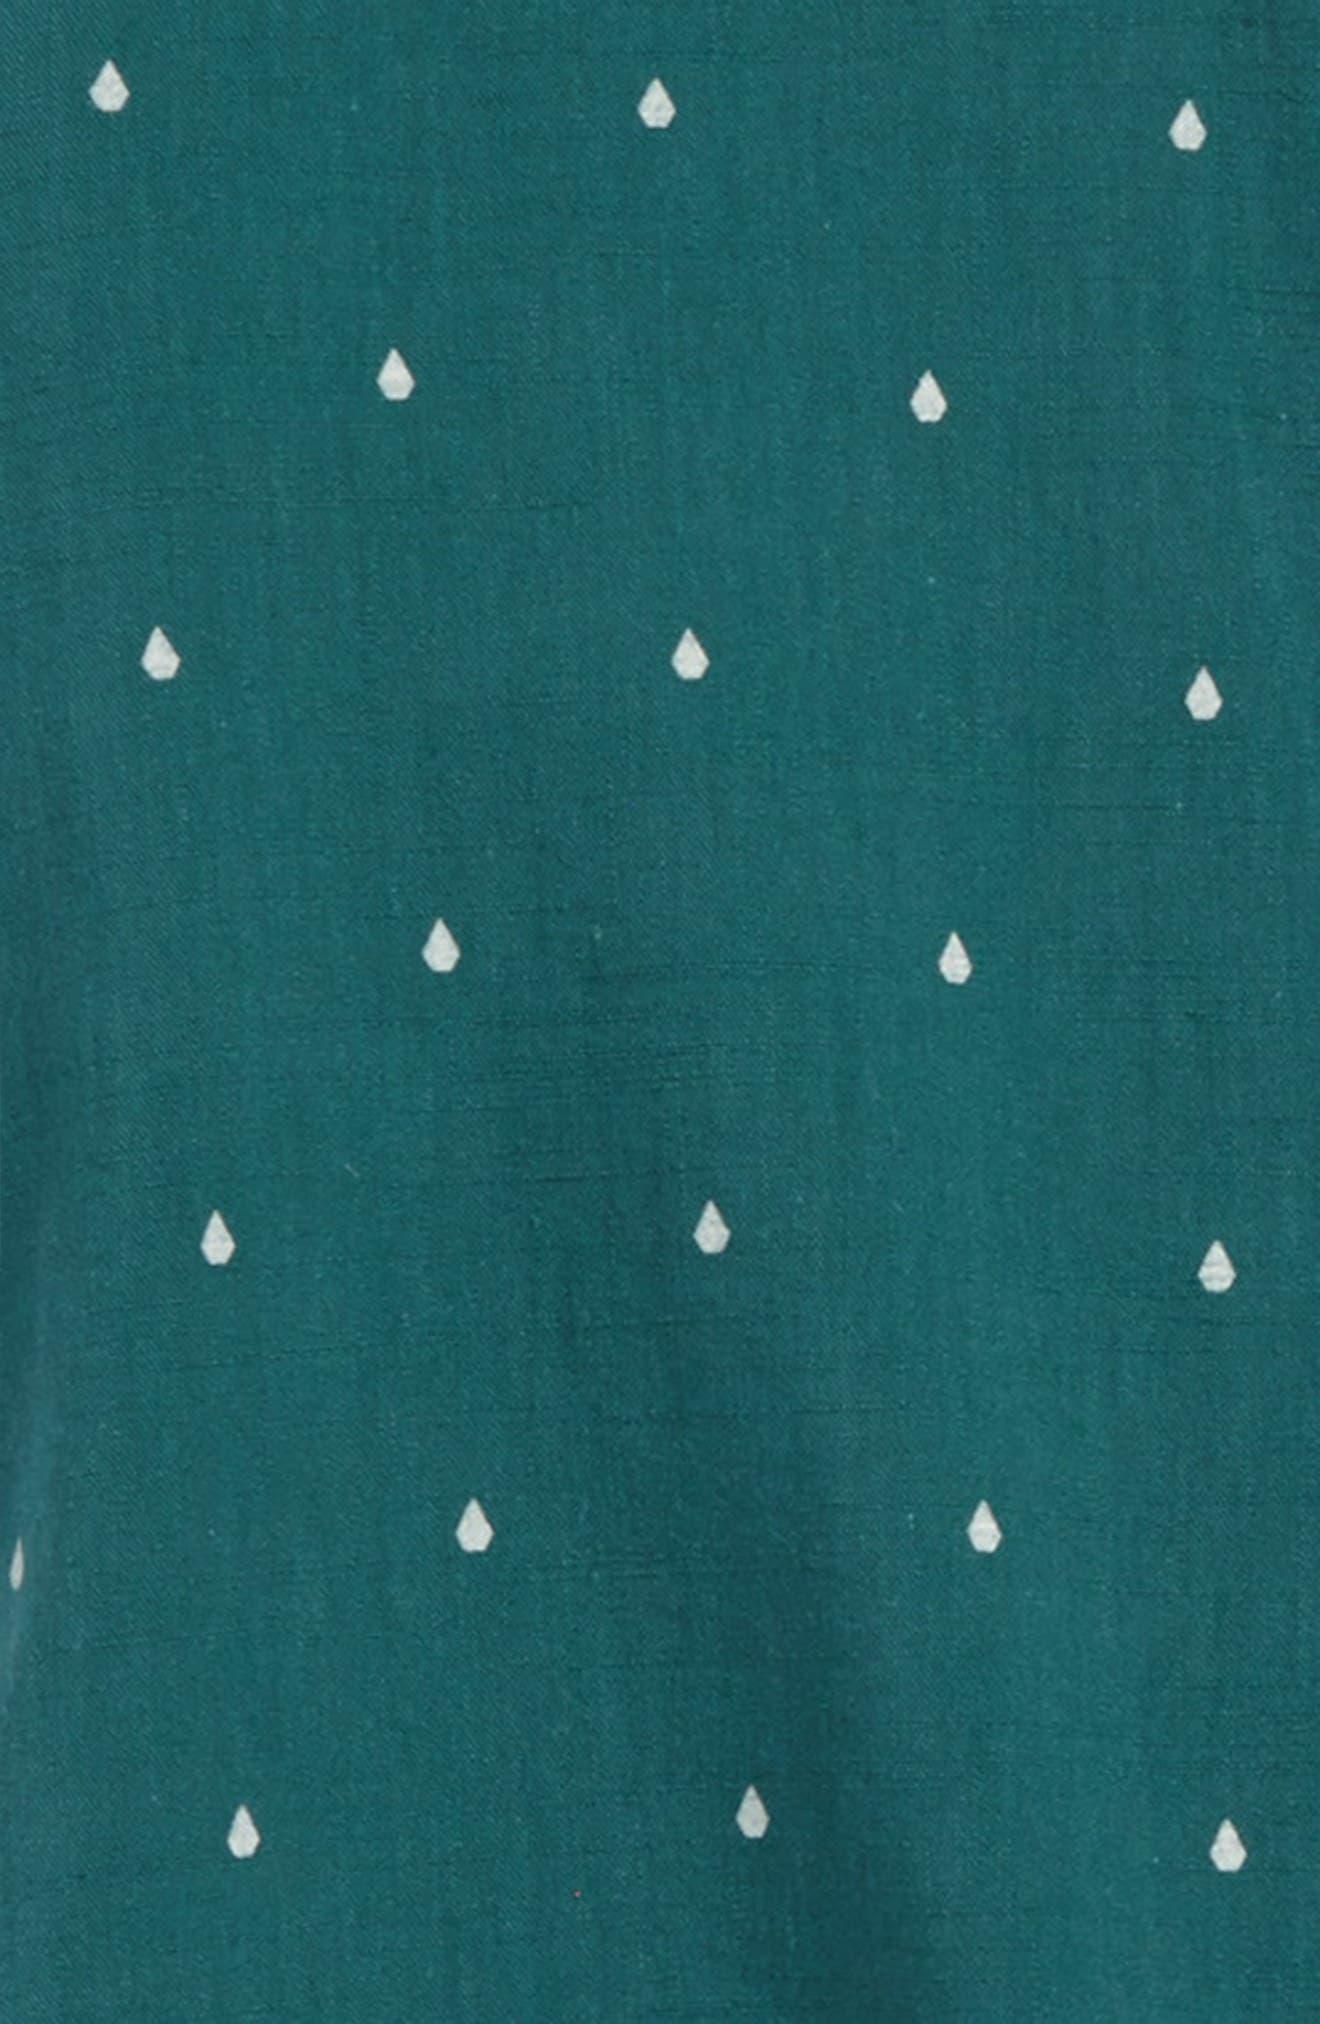 Stone Short Sleeve Woven Shirt,                             Alternate thumbnail 2, color,                             Green